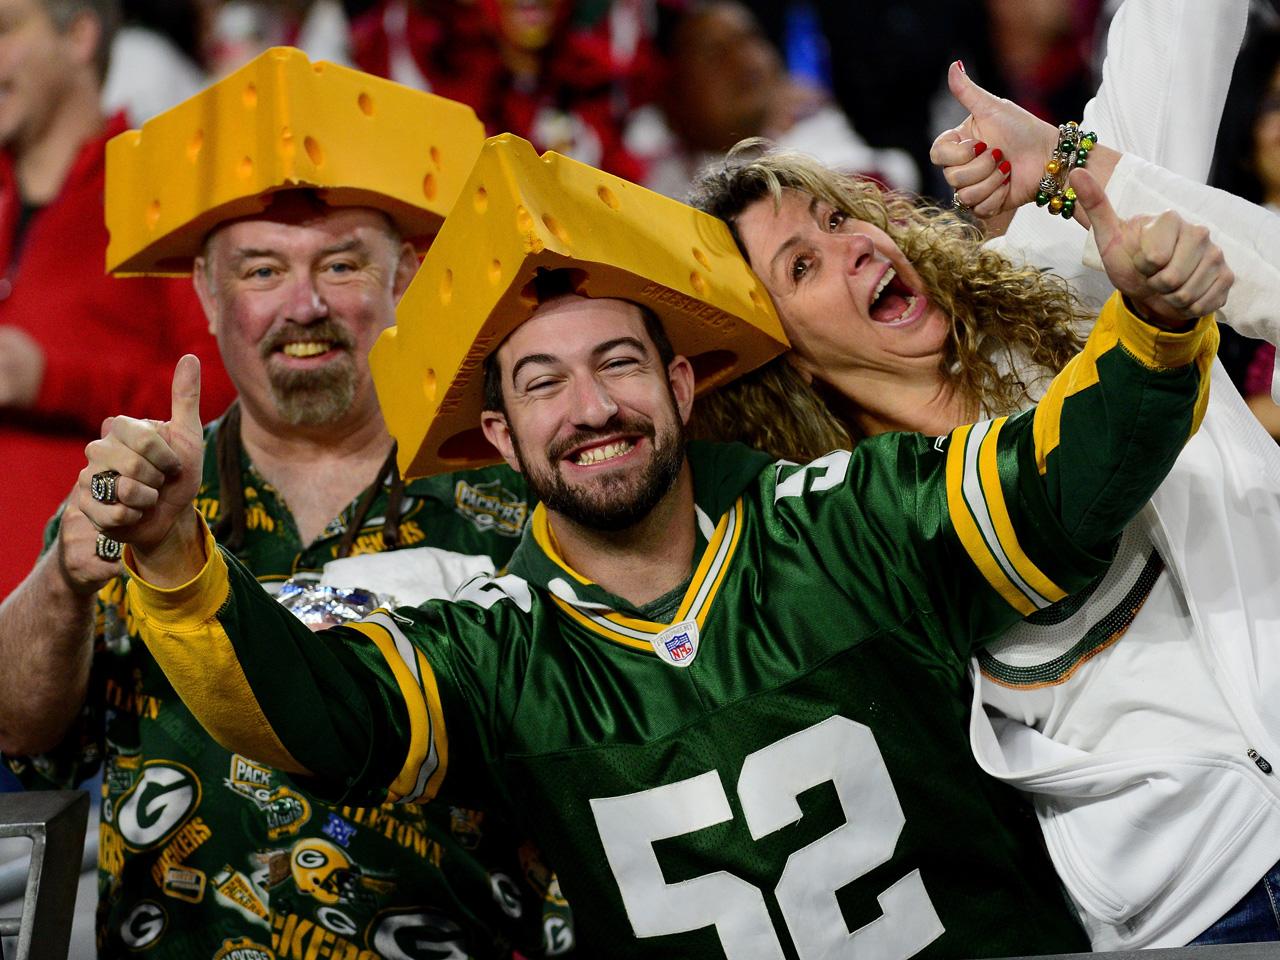 CBS News poll: How obsessive are sports fans? - CBS News